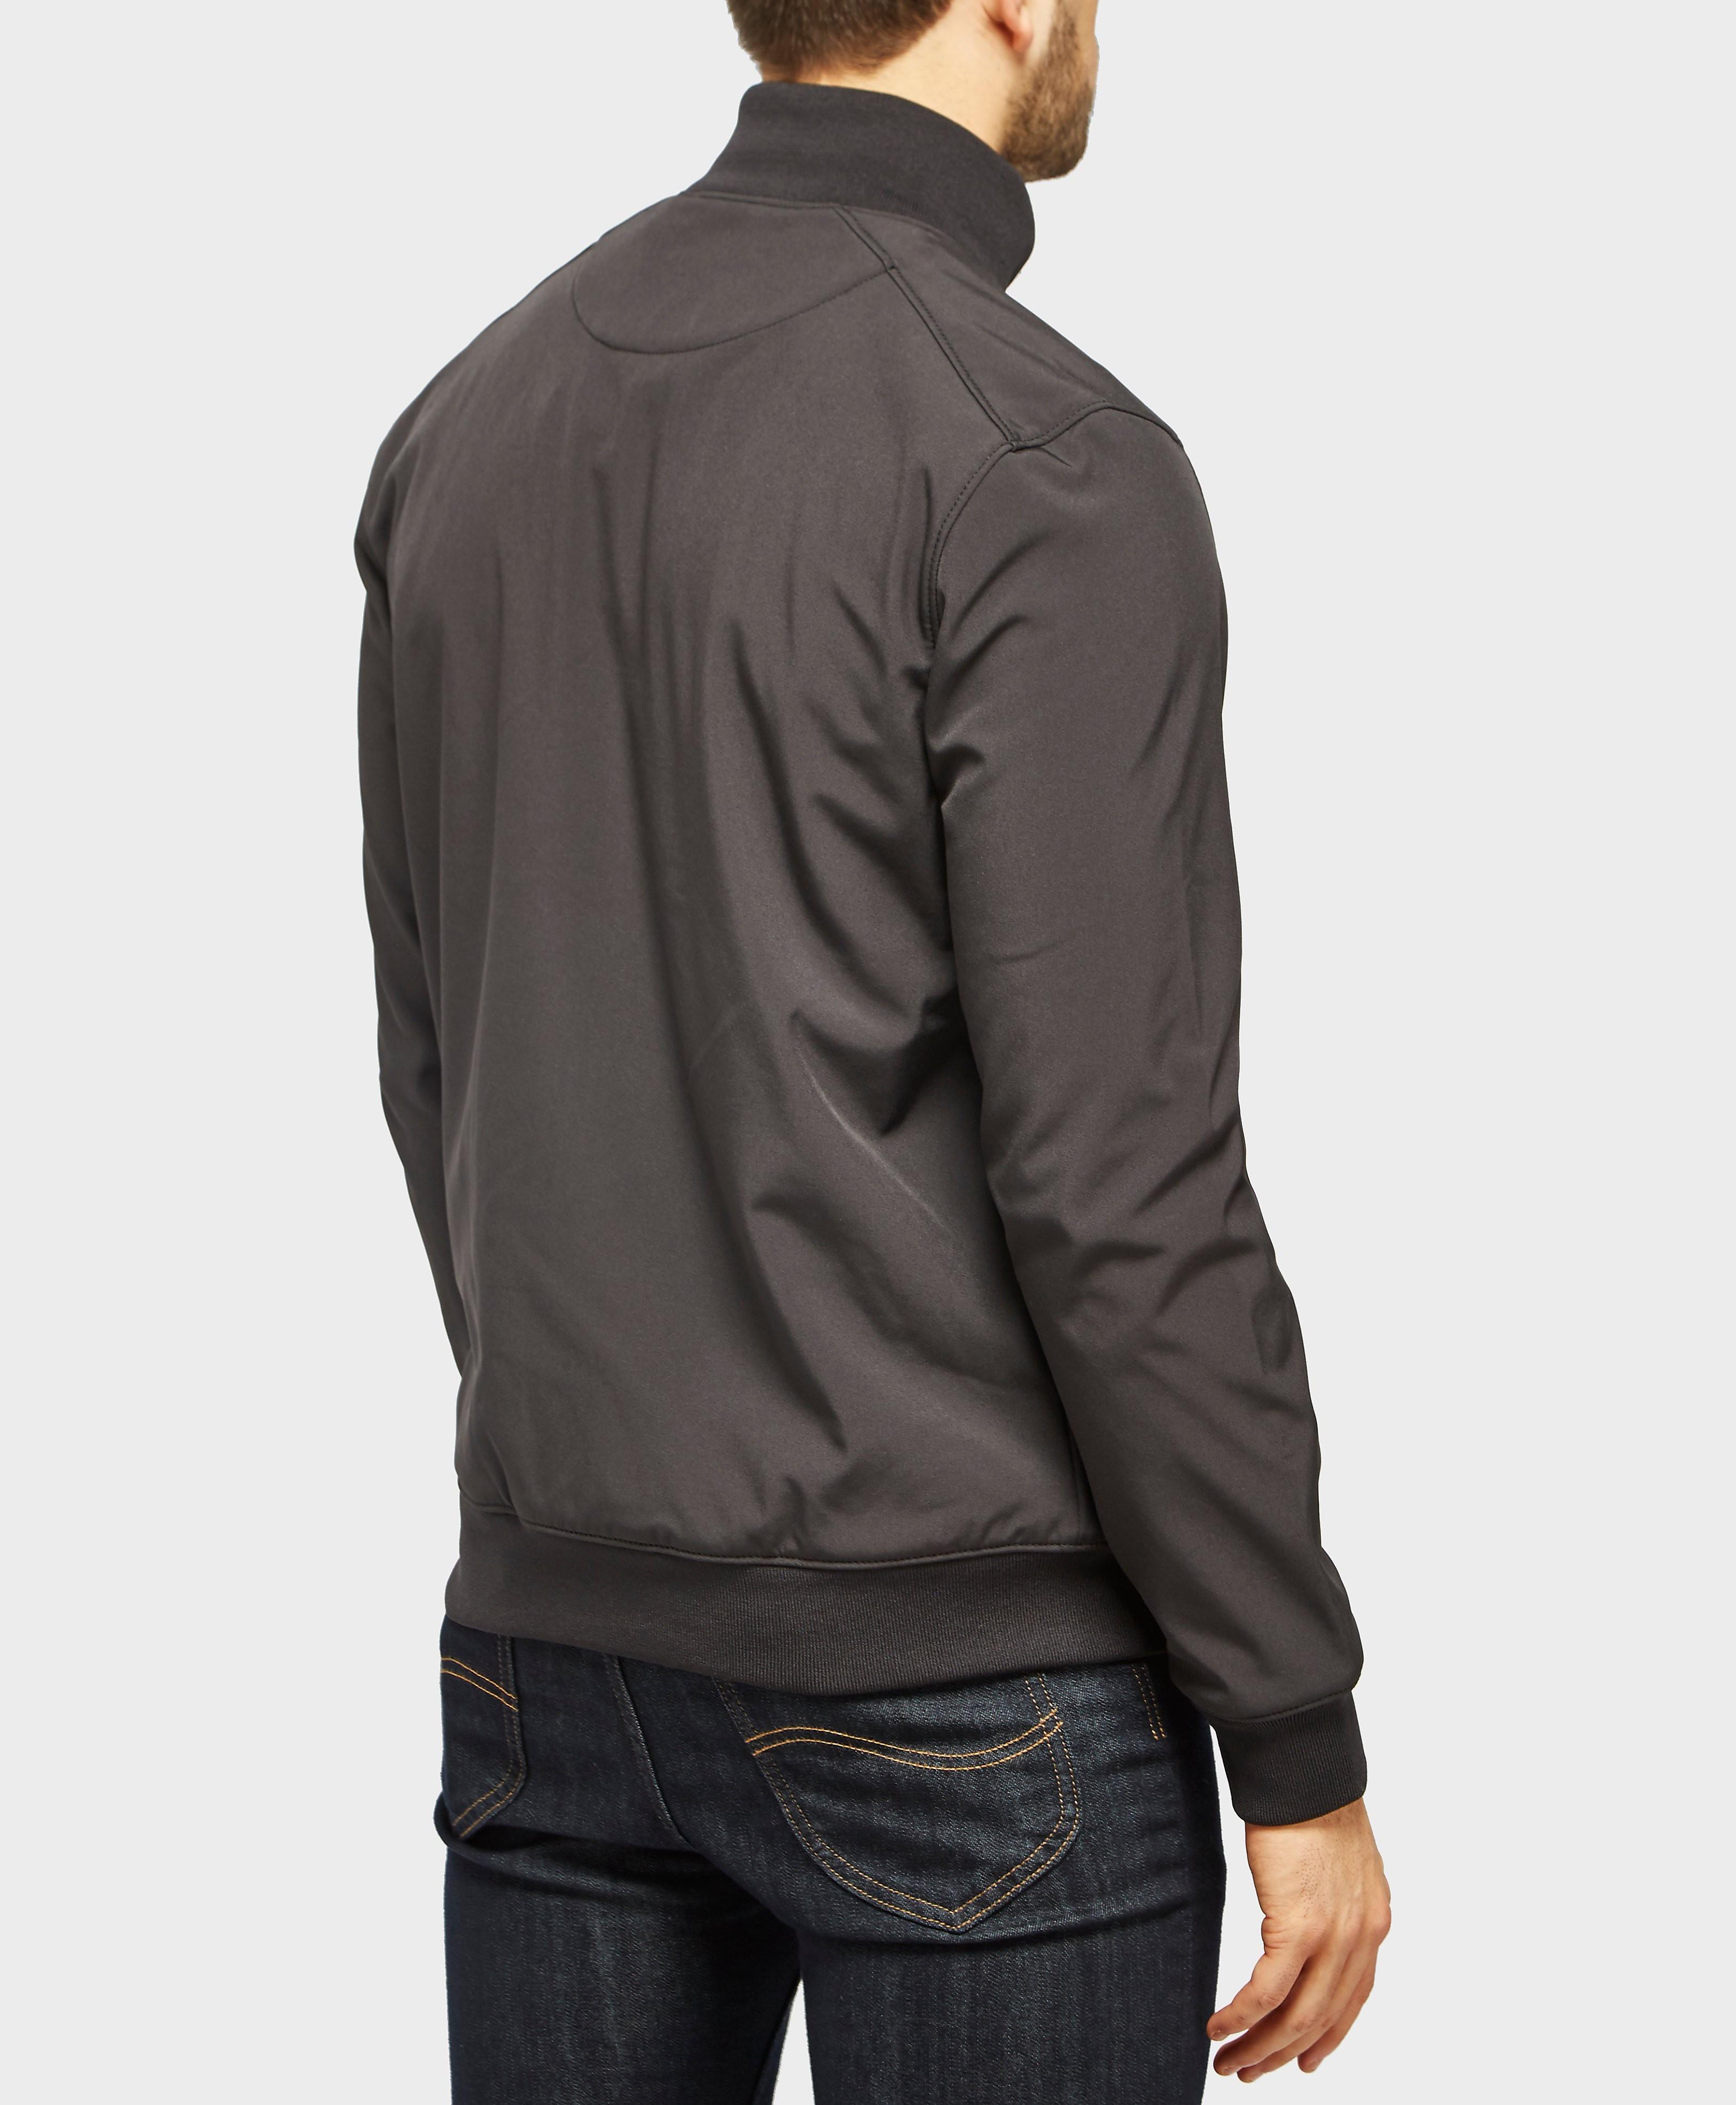 Lyle & Scott Soft Shell Jacket